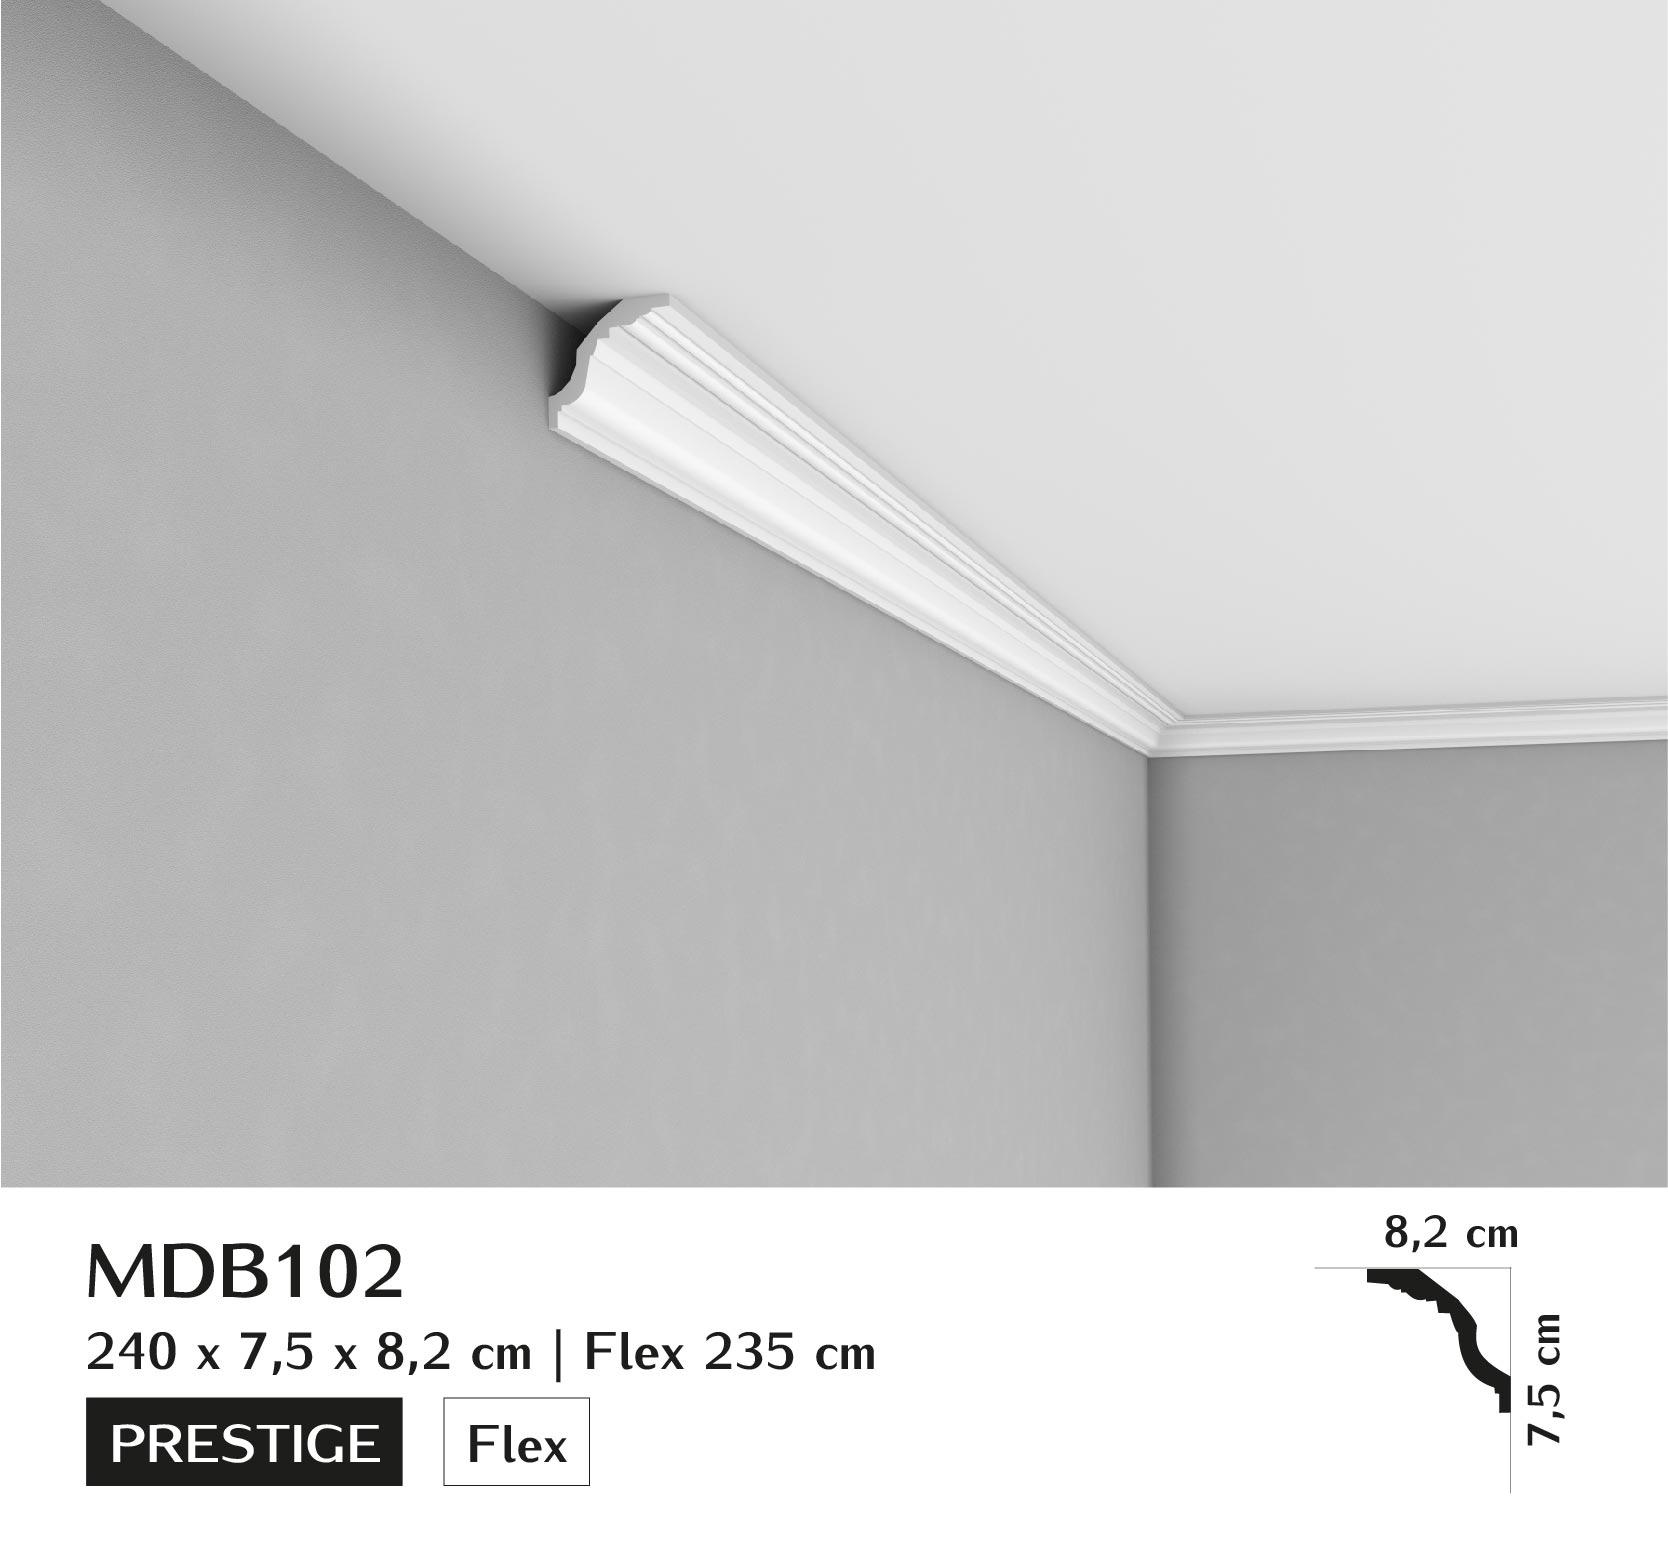 Mdb102